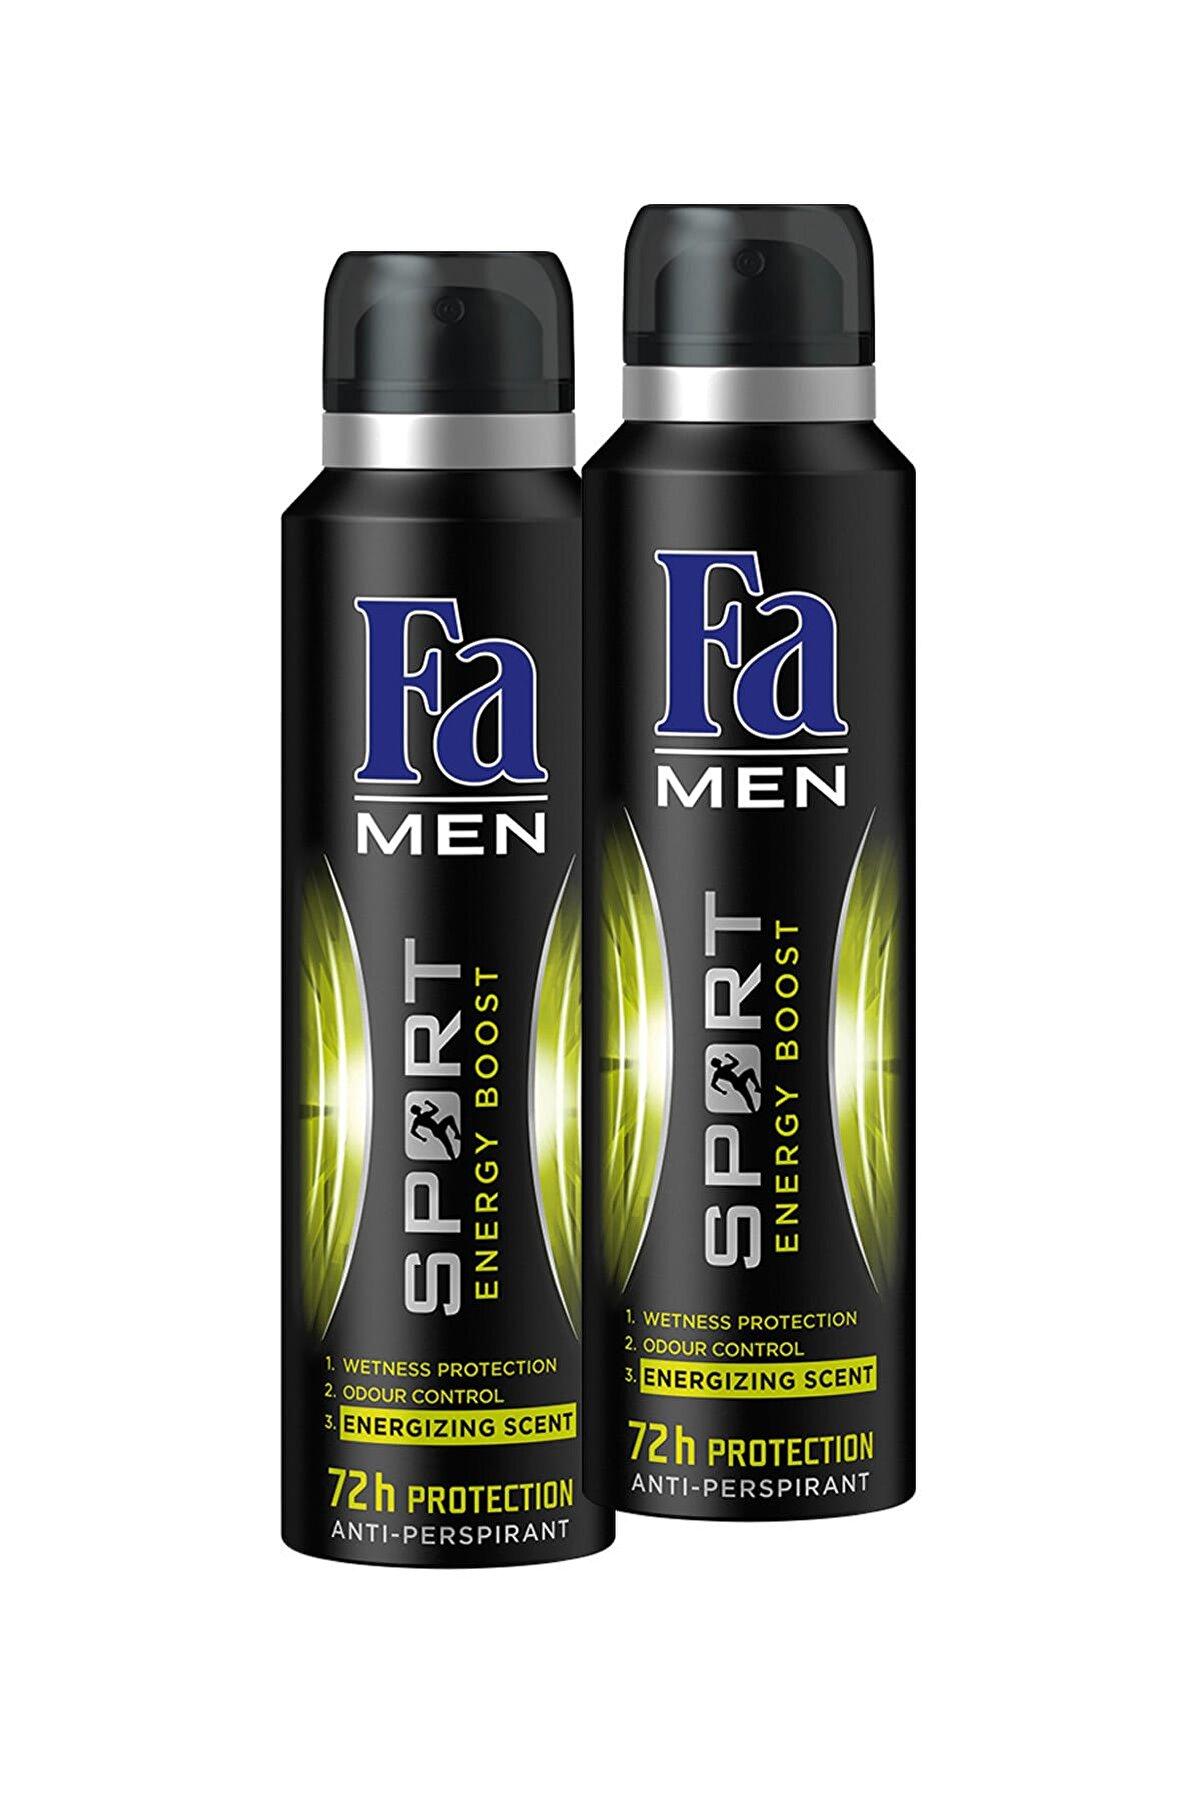 Fa Double Power Men Sport (Yeni Adıyla Sport Energy Boost) Deo Spray 150 ml x 2 Paket